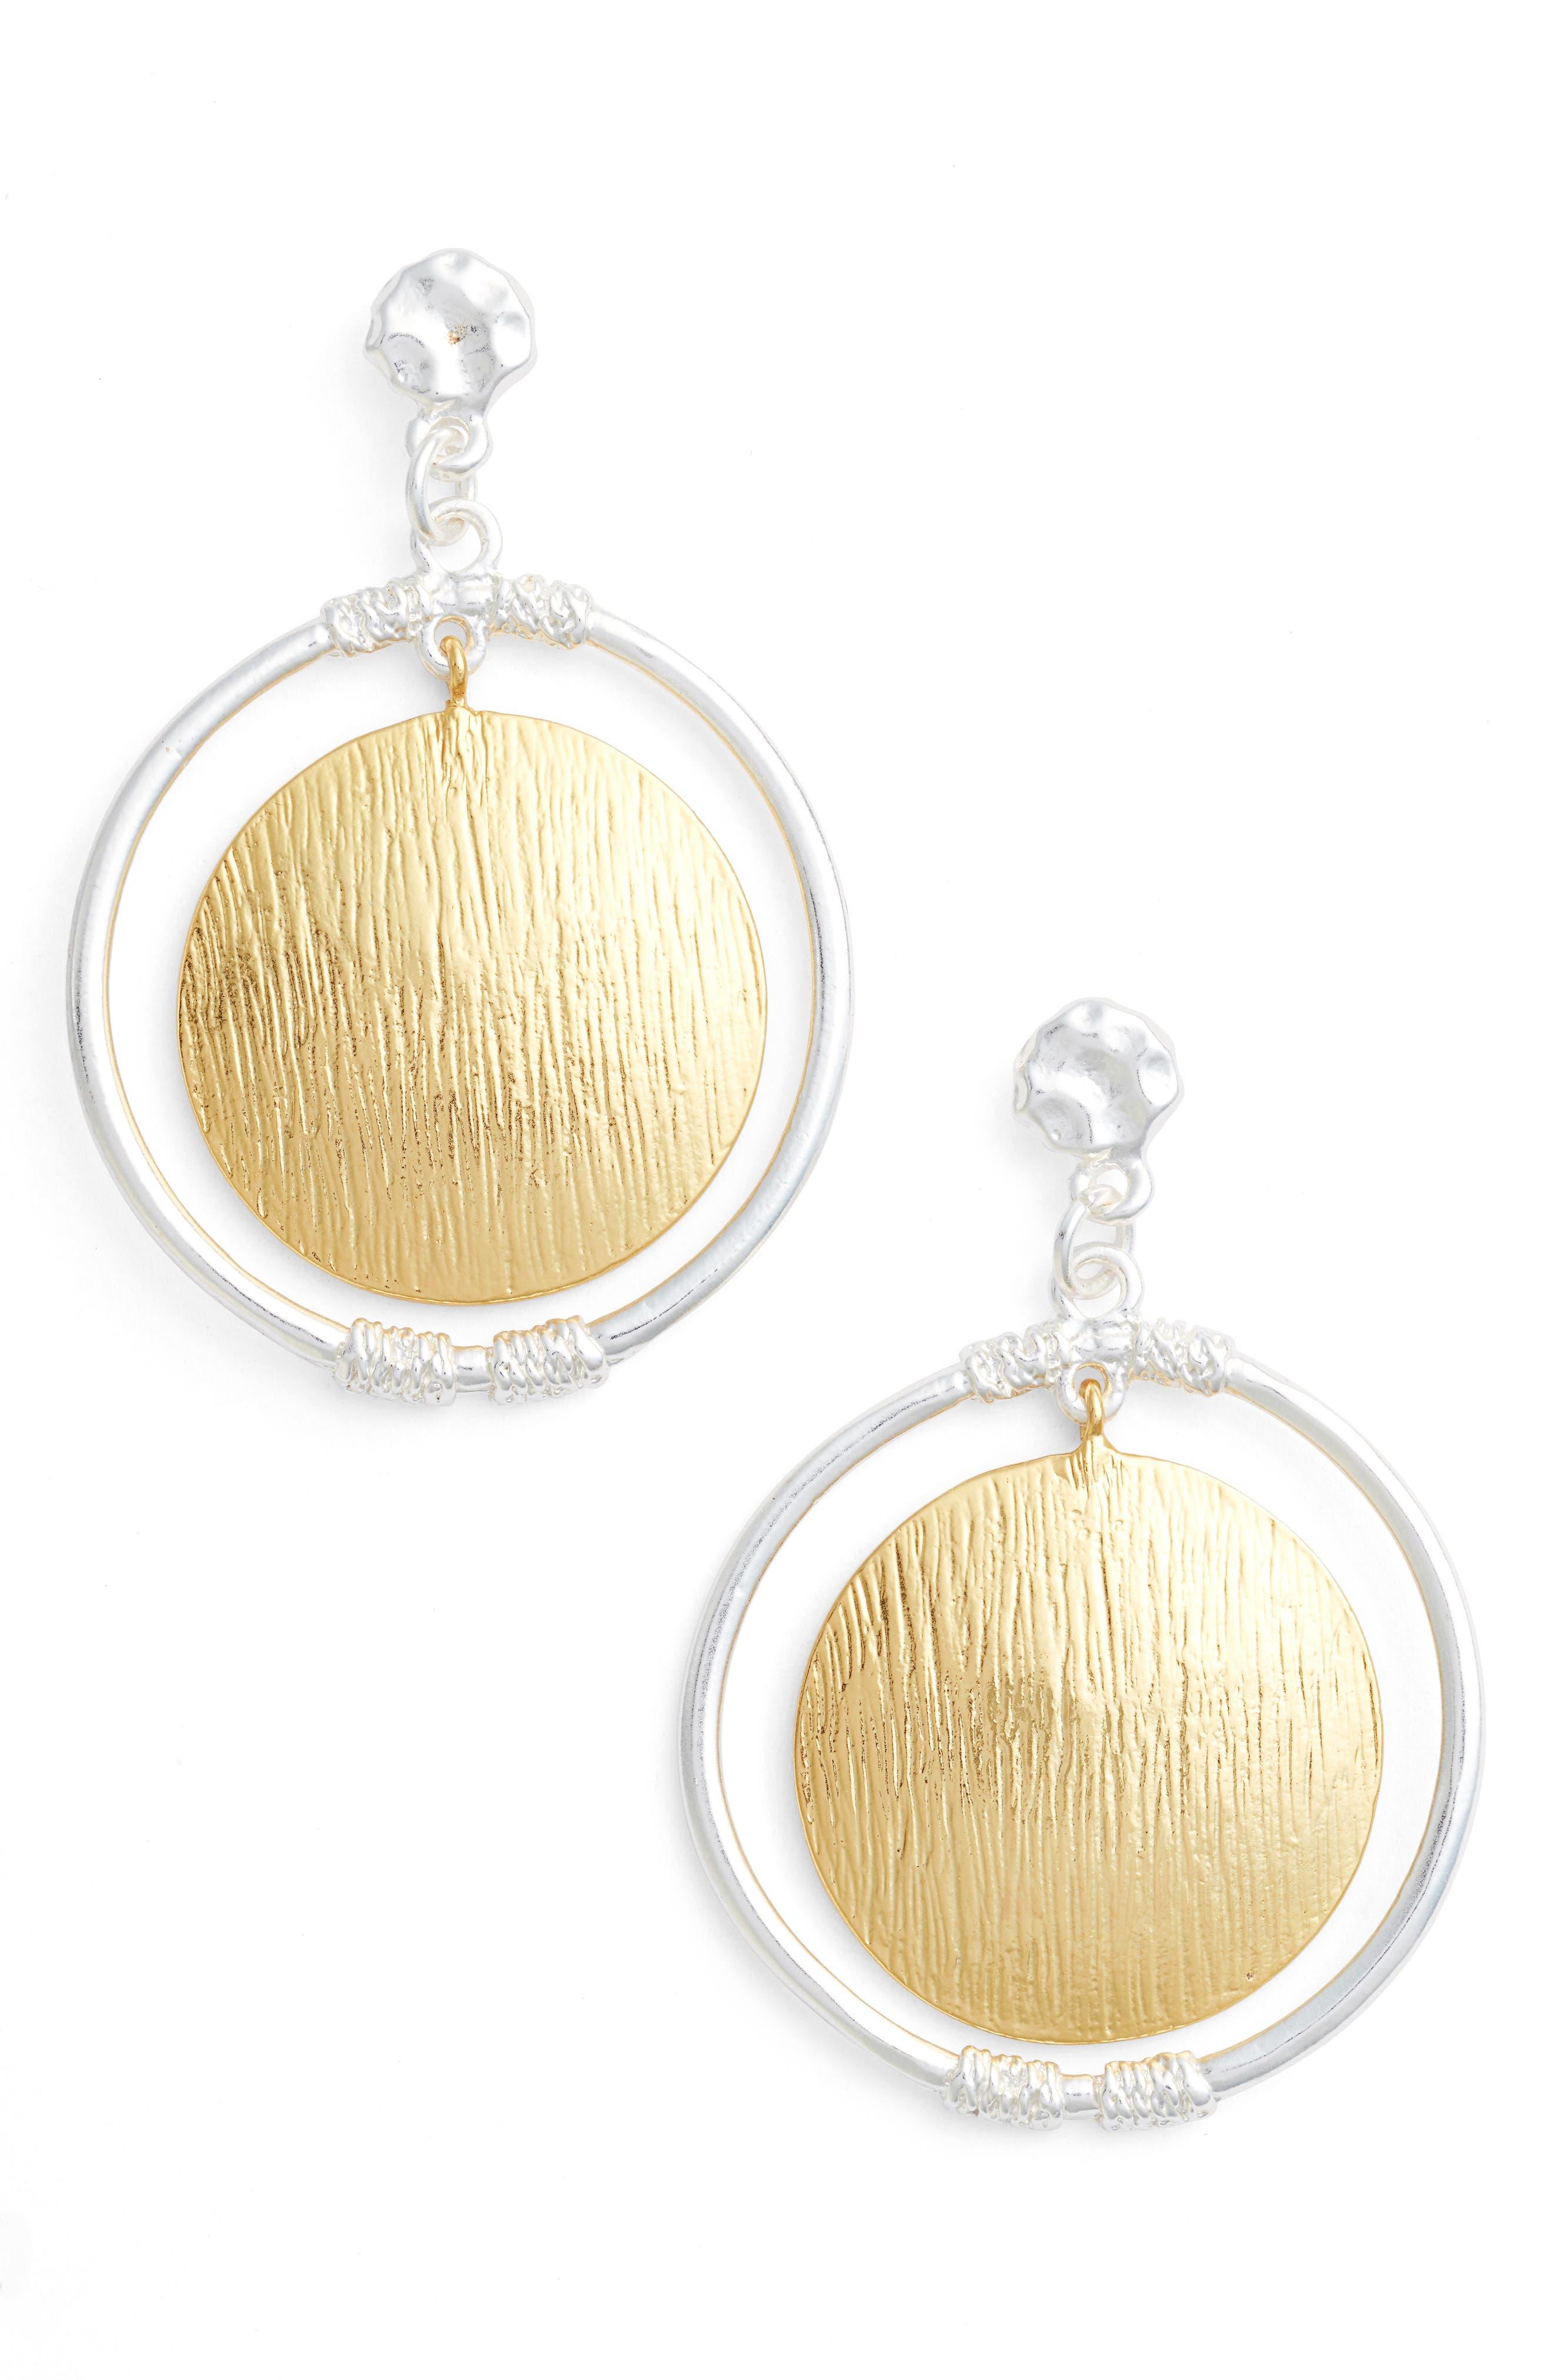 KARINE SULTAN Two-Tone Drop Earrings